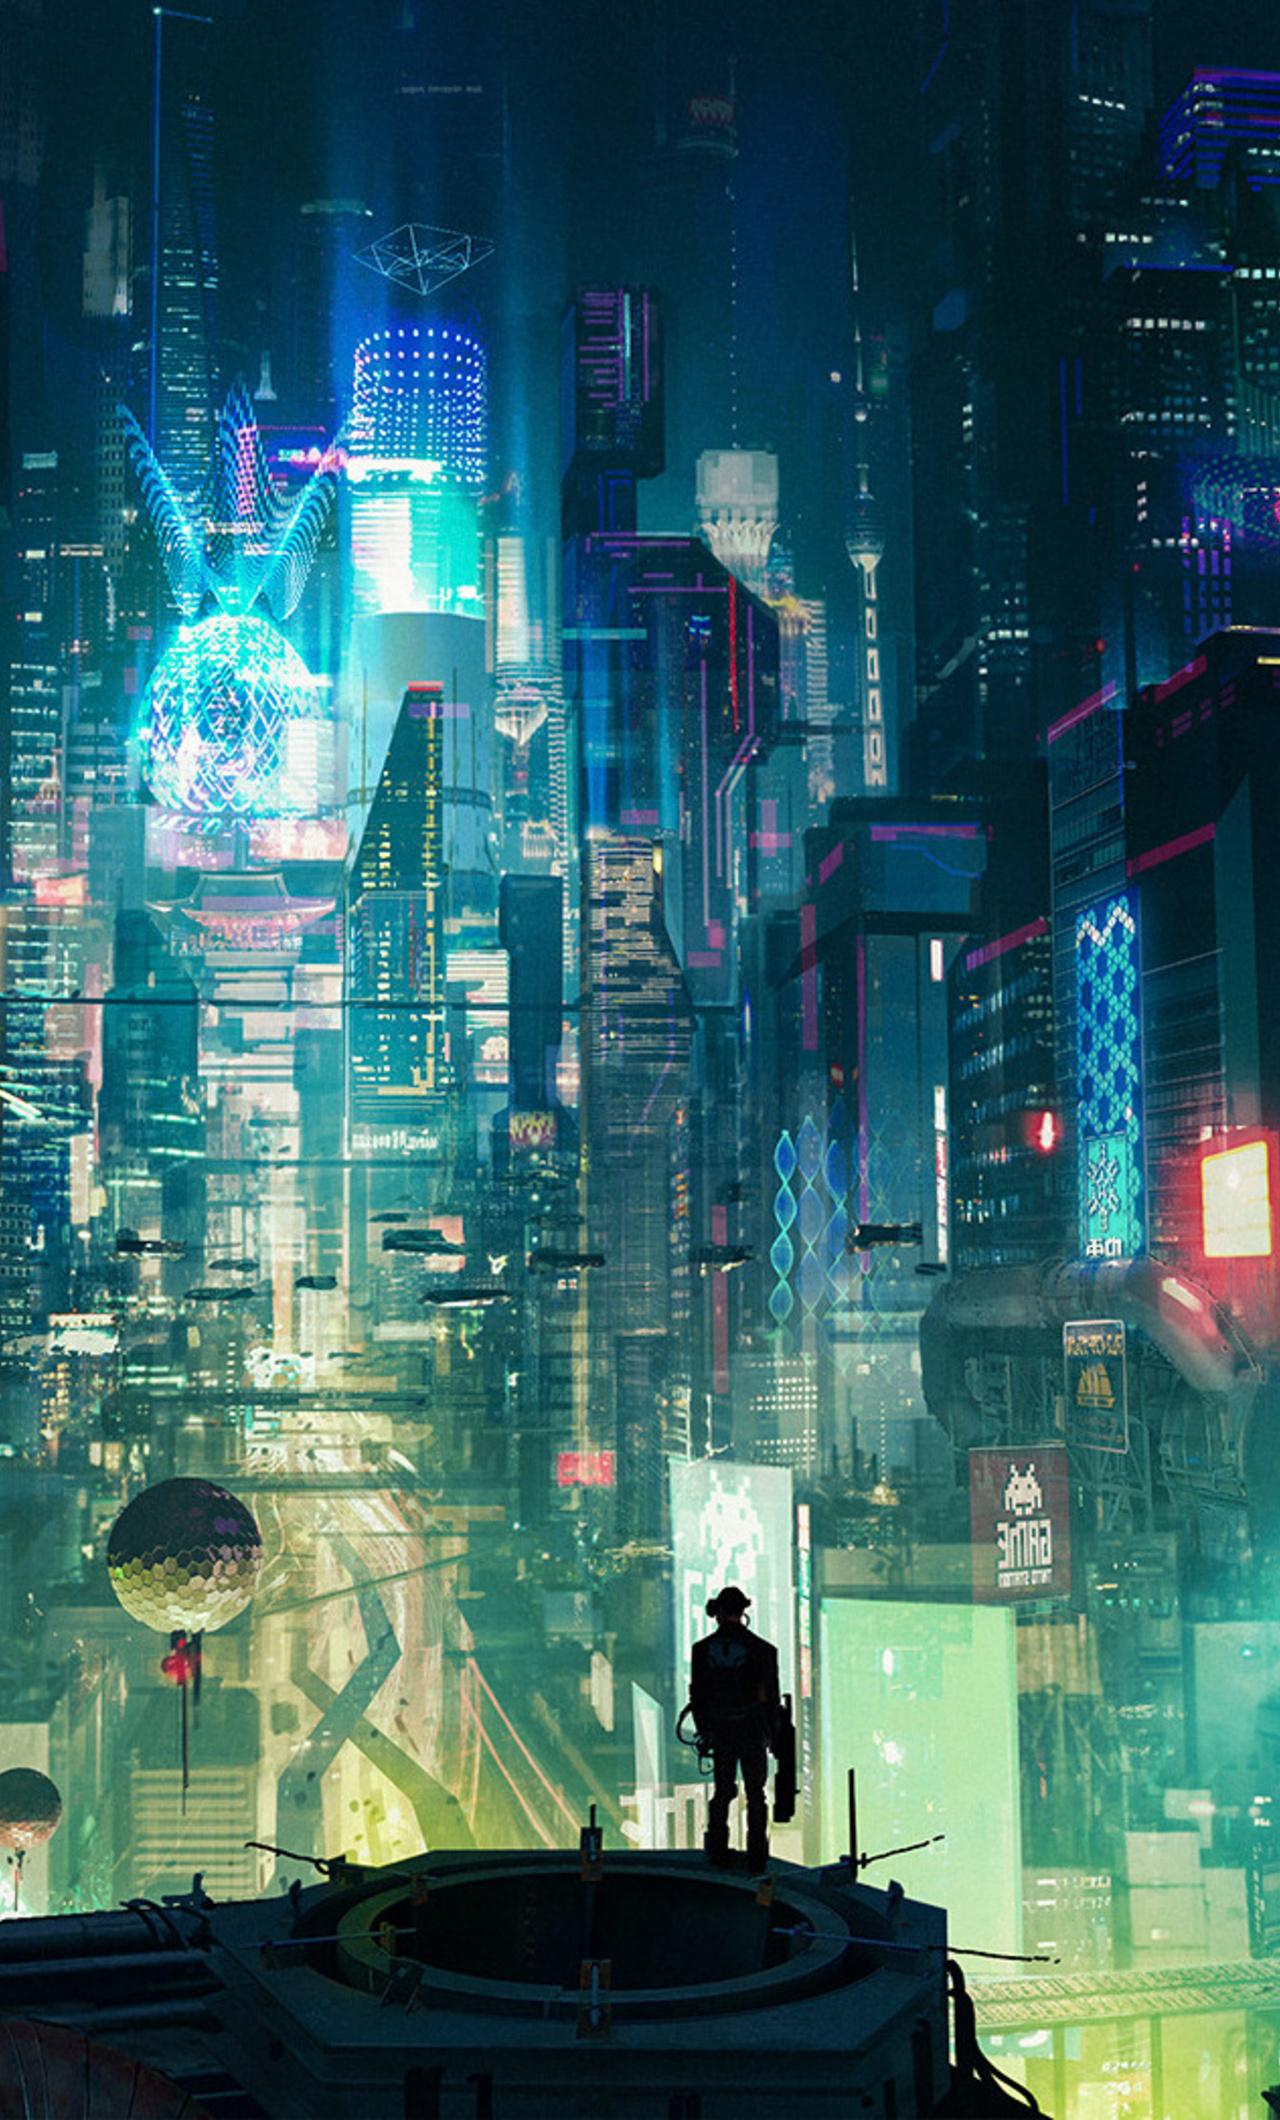 1280x2120 Cyberpunk City iPhone 6+ HD 4k Wallpapers ...